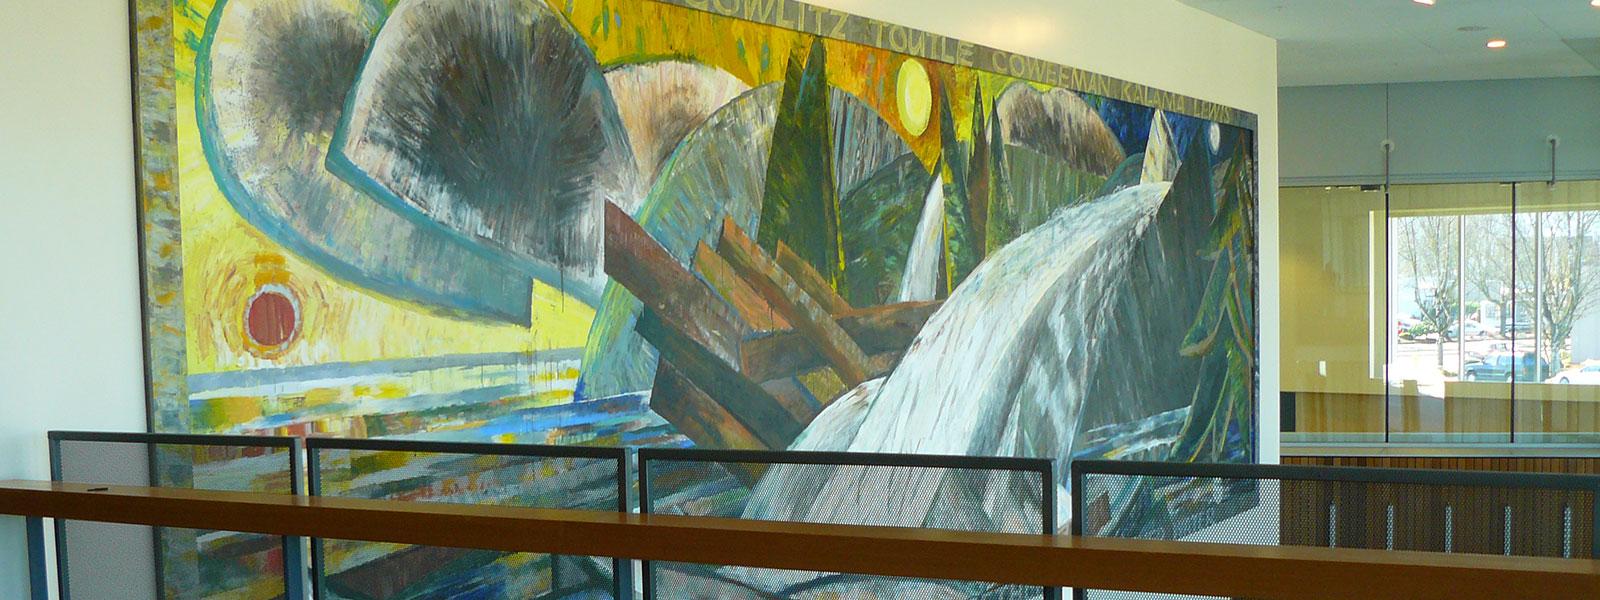 rca lobby mural